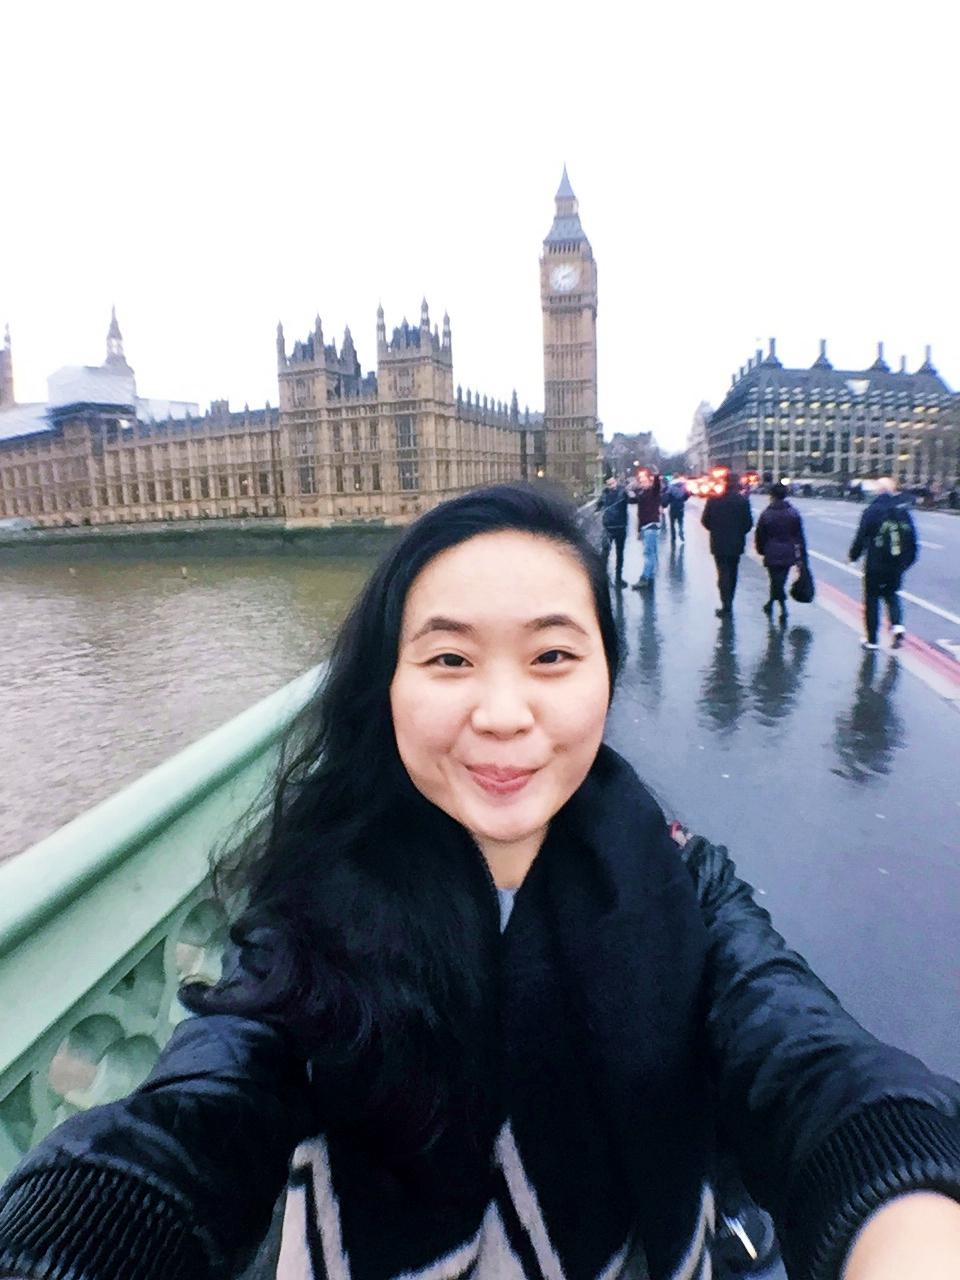 8 Dec 2016: Big Ben | London, England